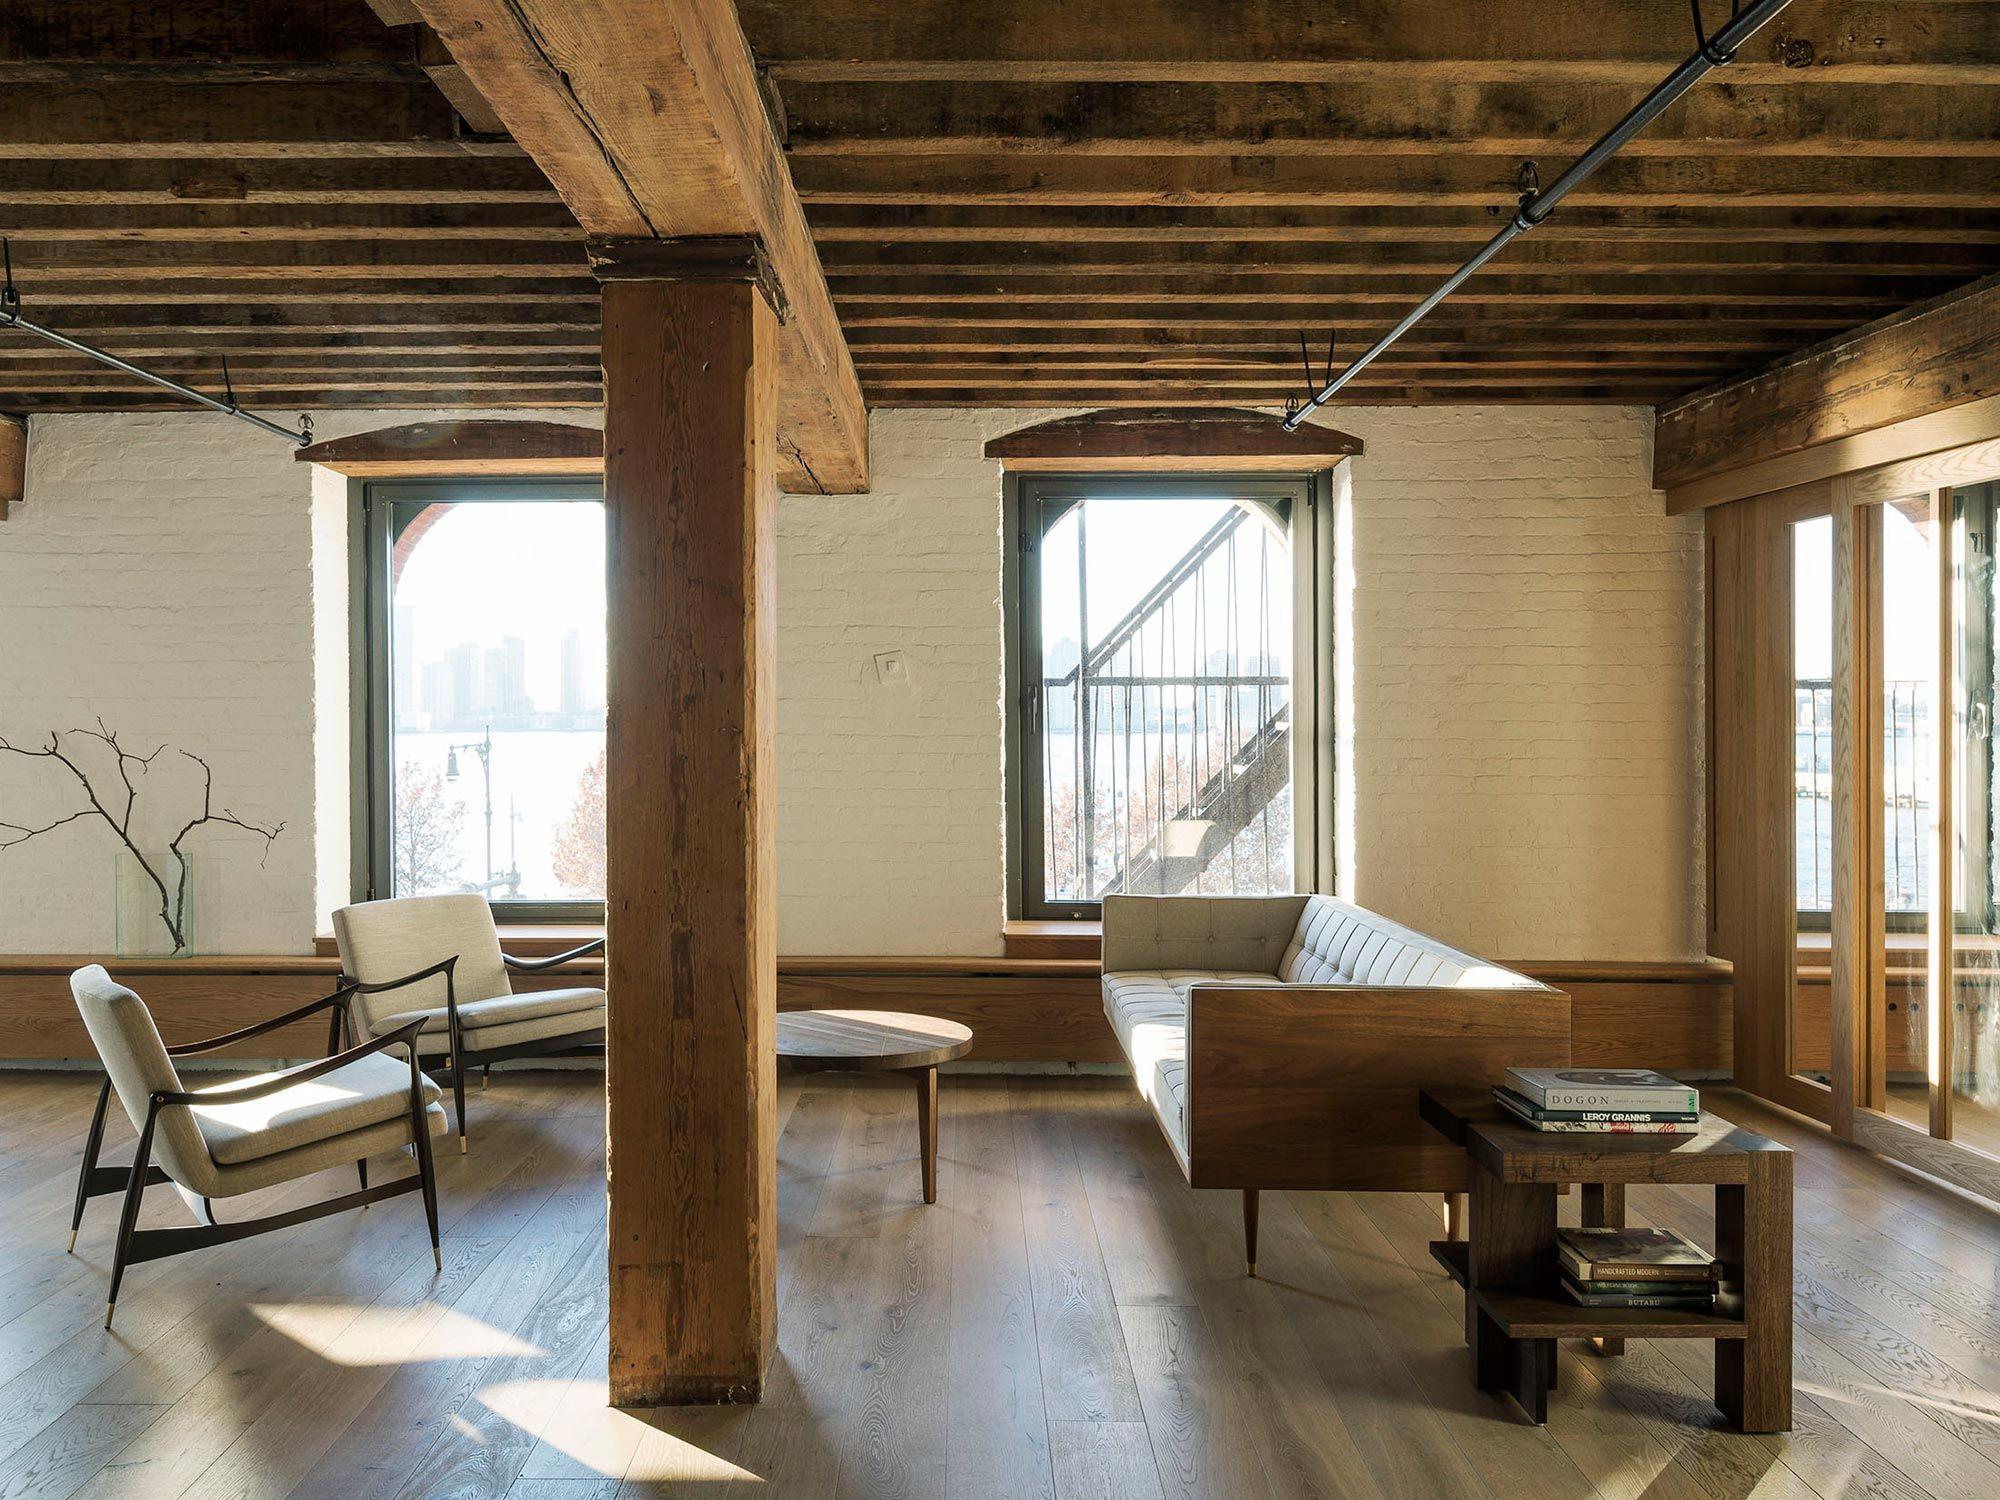 A Loft Renovation Interior Design Project In Tribeca New York